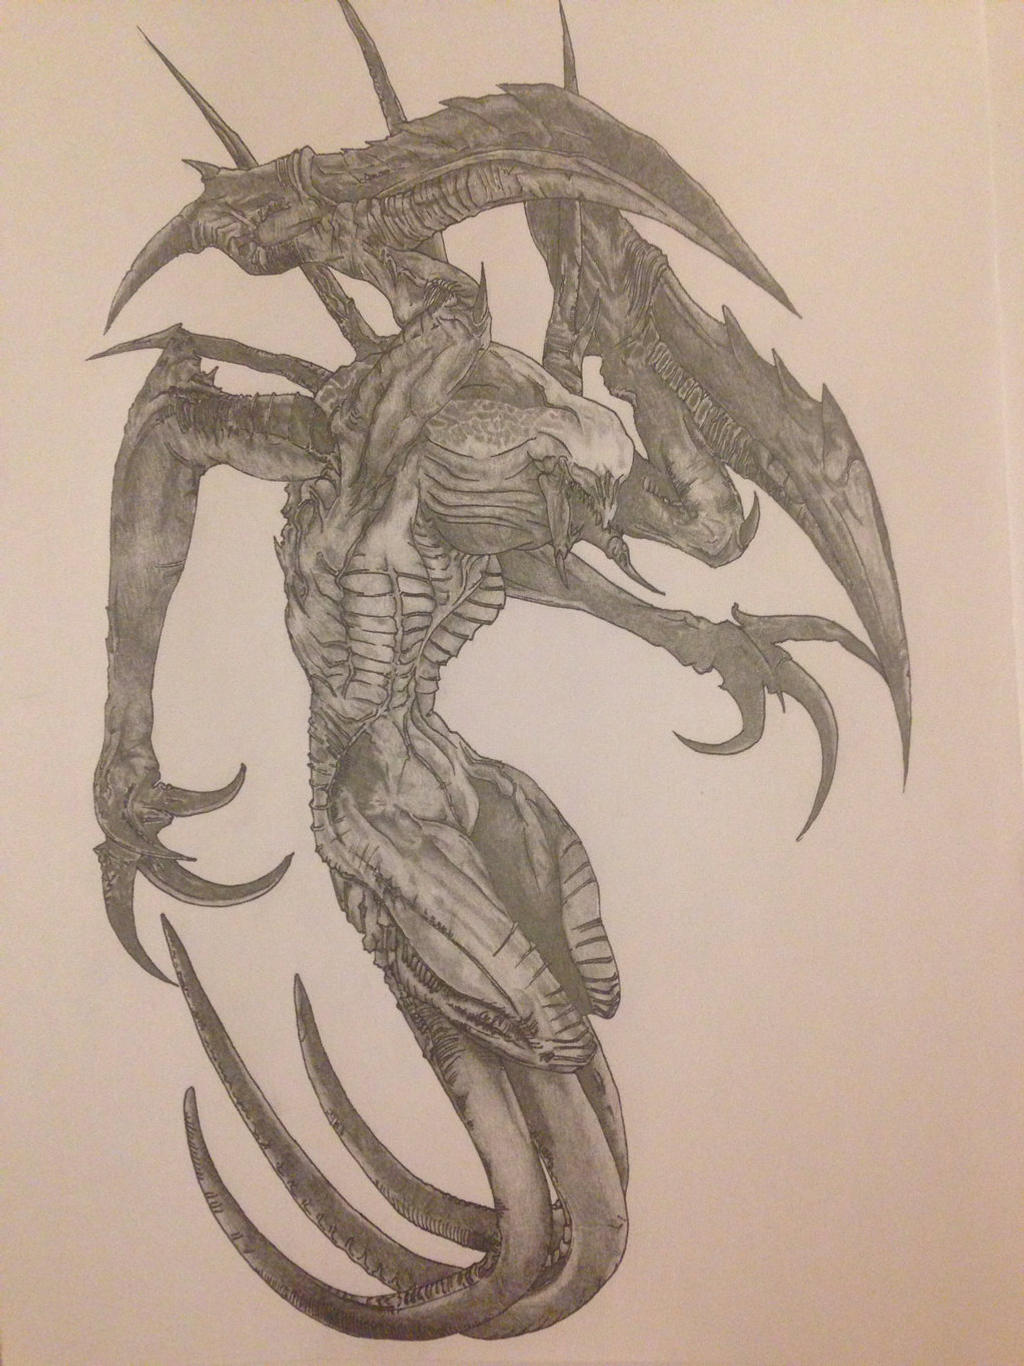 evolve___wraith_by_lollingtroll_d8grmfl-fullview.jpg